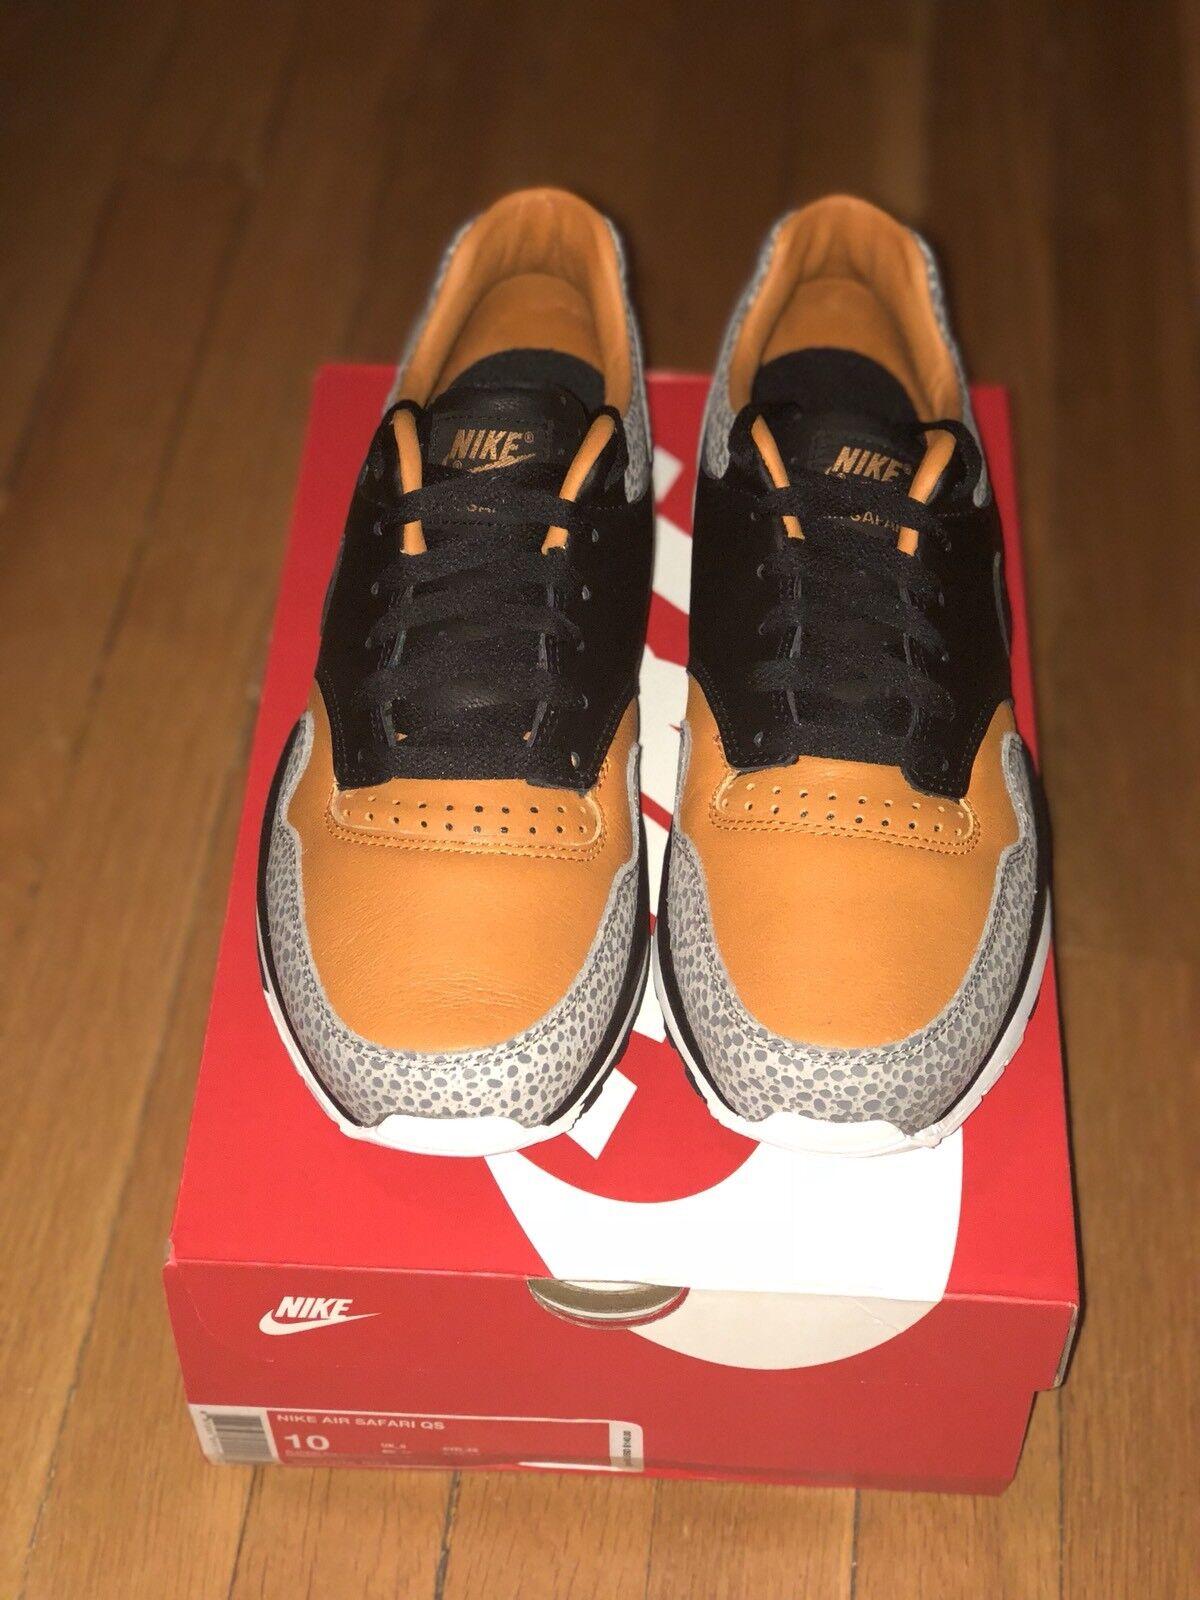 Hombres Nike Air negro Safari QS ao3295-001 monarca negro Air / negro envio gratis Wild Casual Shoes c4b1a8